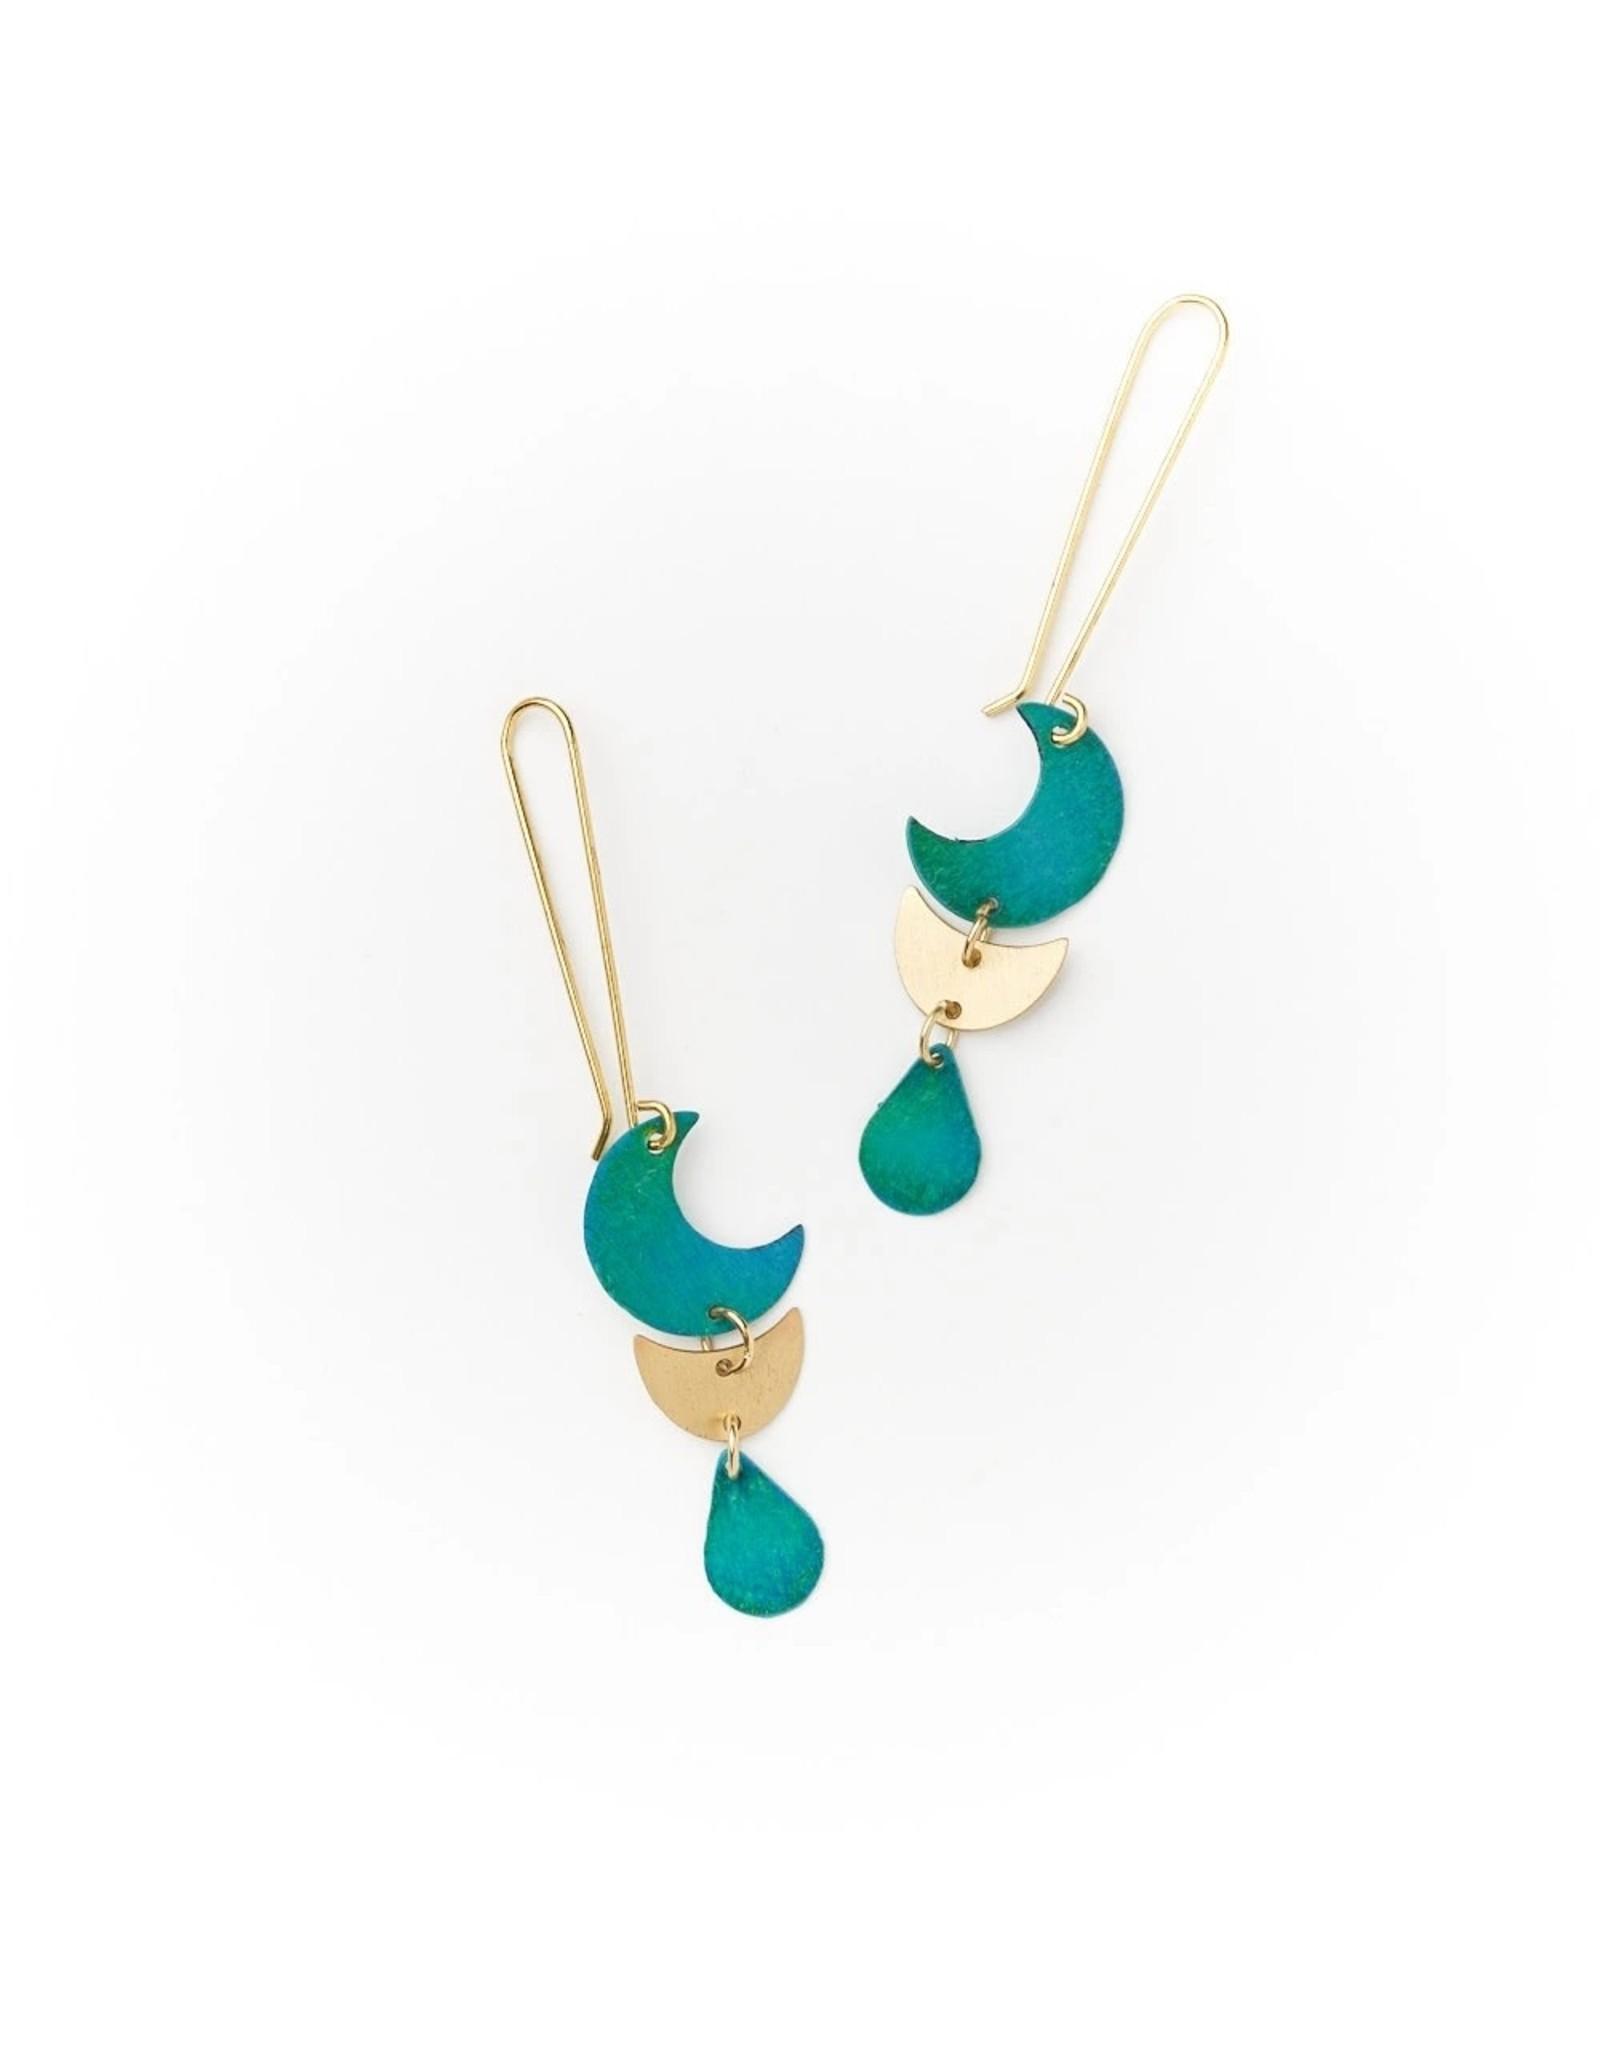 Matr Boomie Rajani earrings- Teal Drop, India